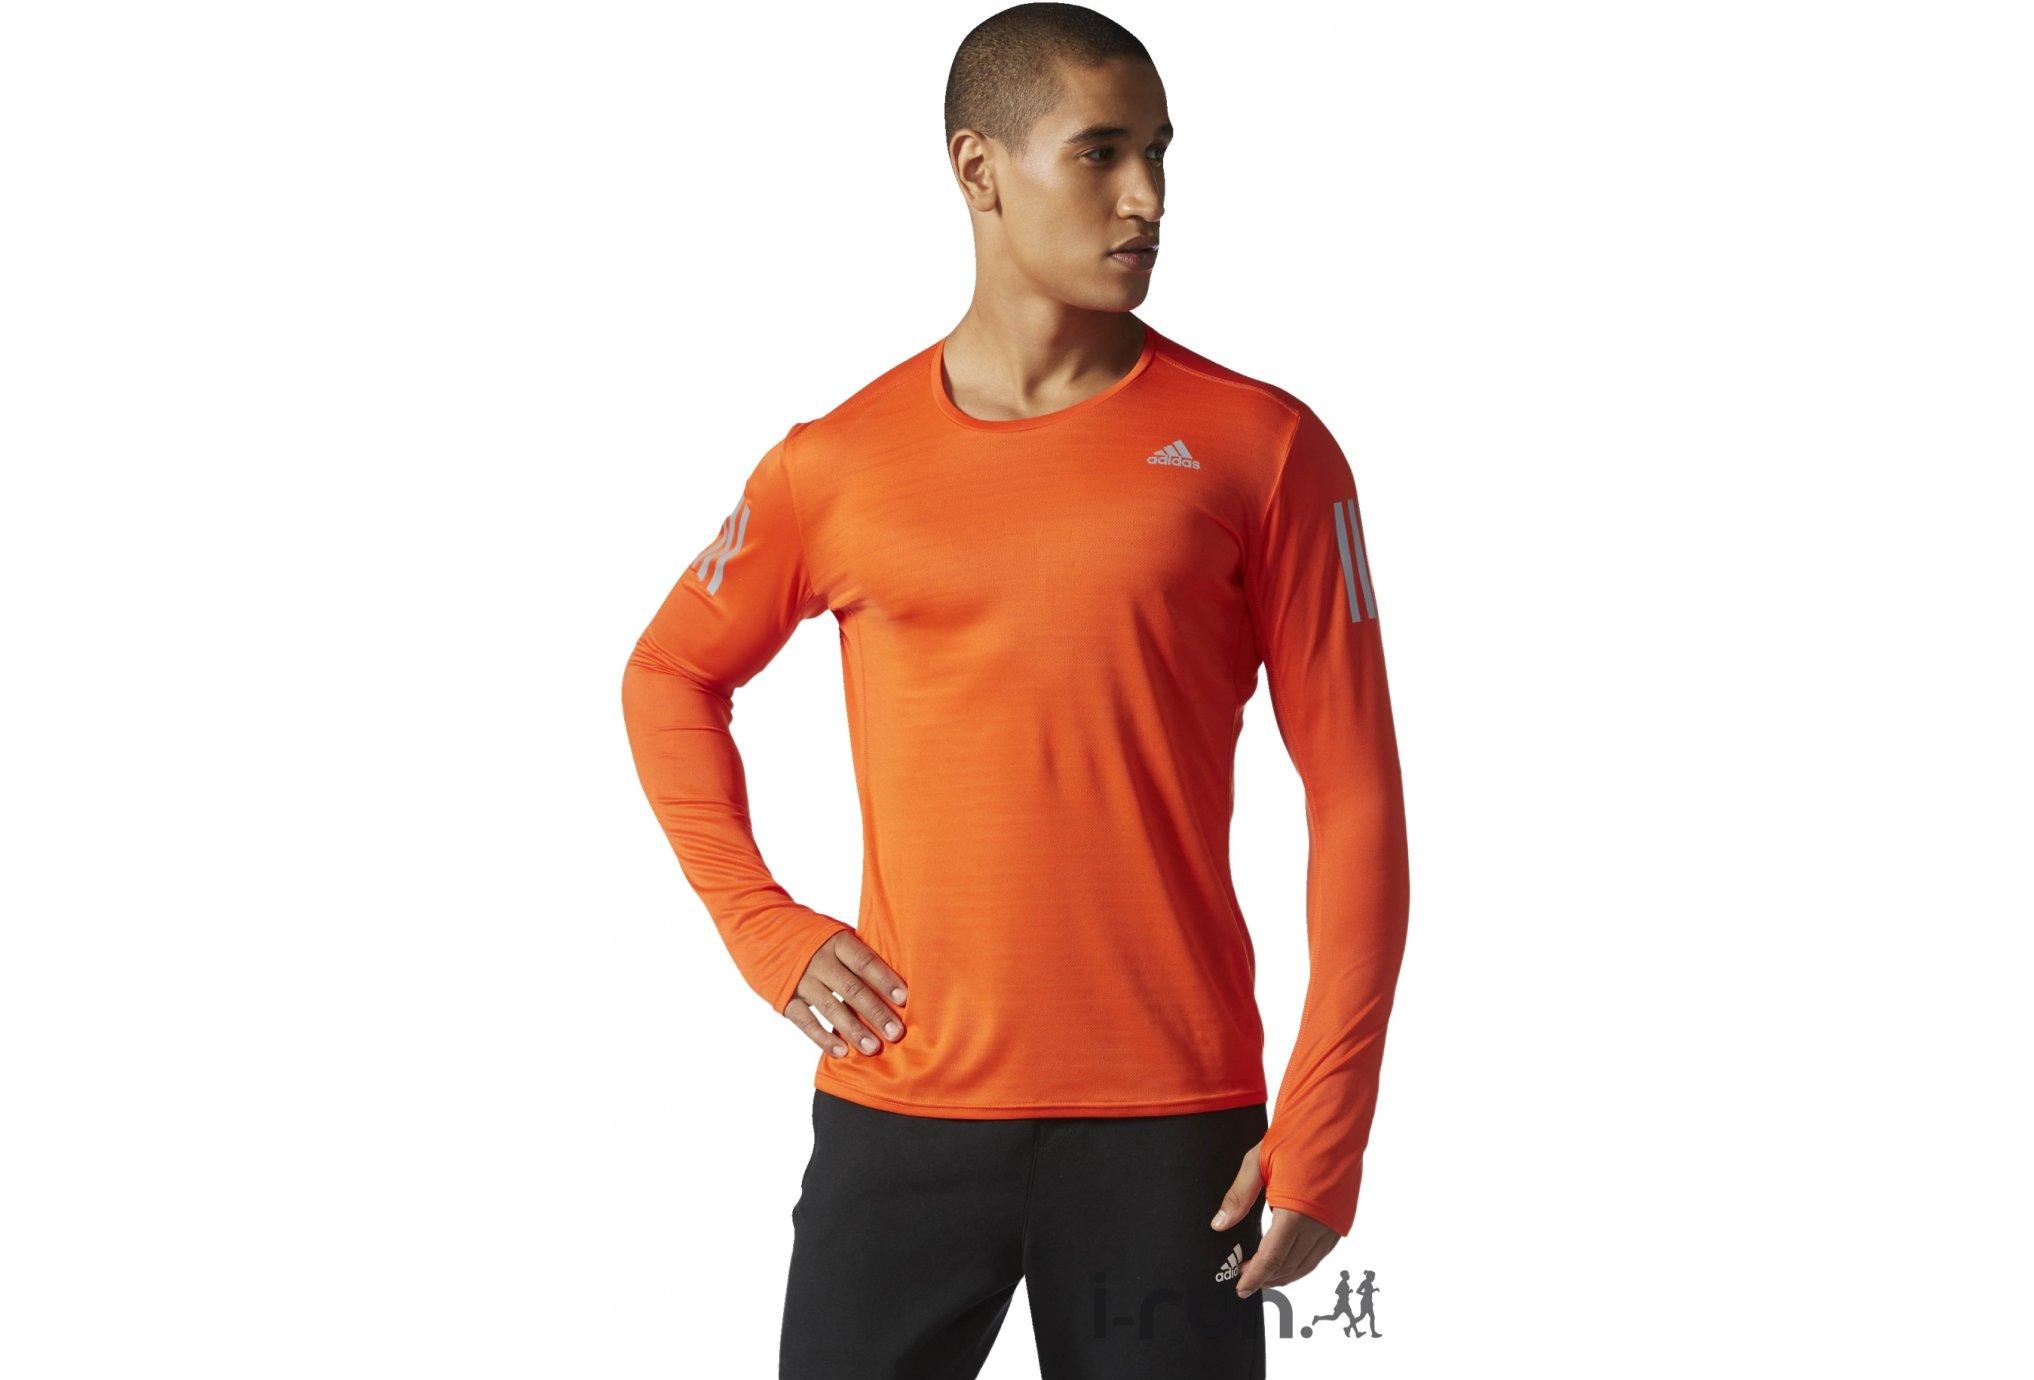 Adidas Response ls m vêtement running homme